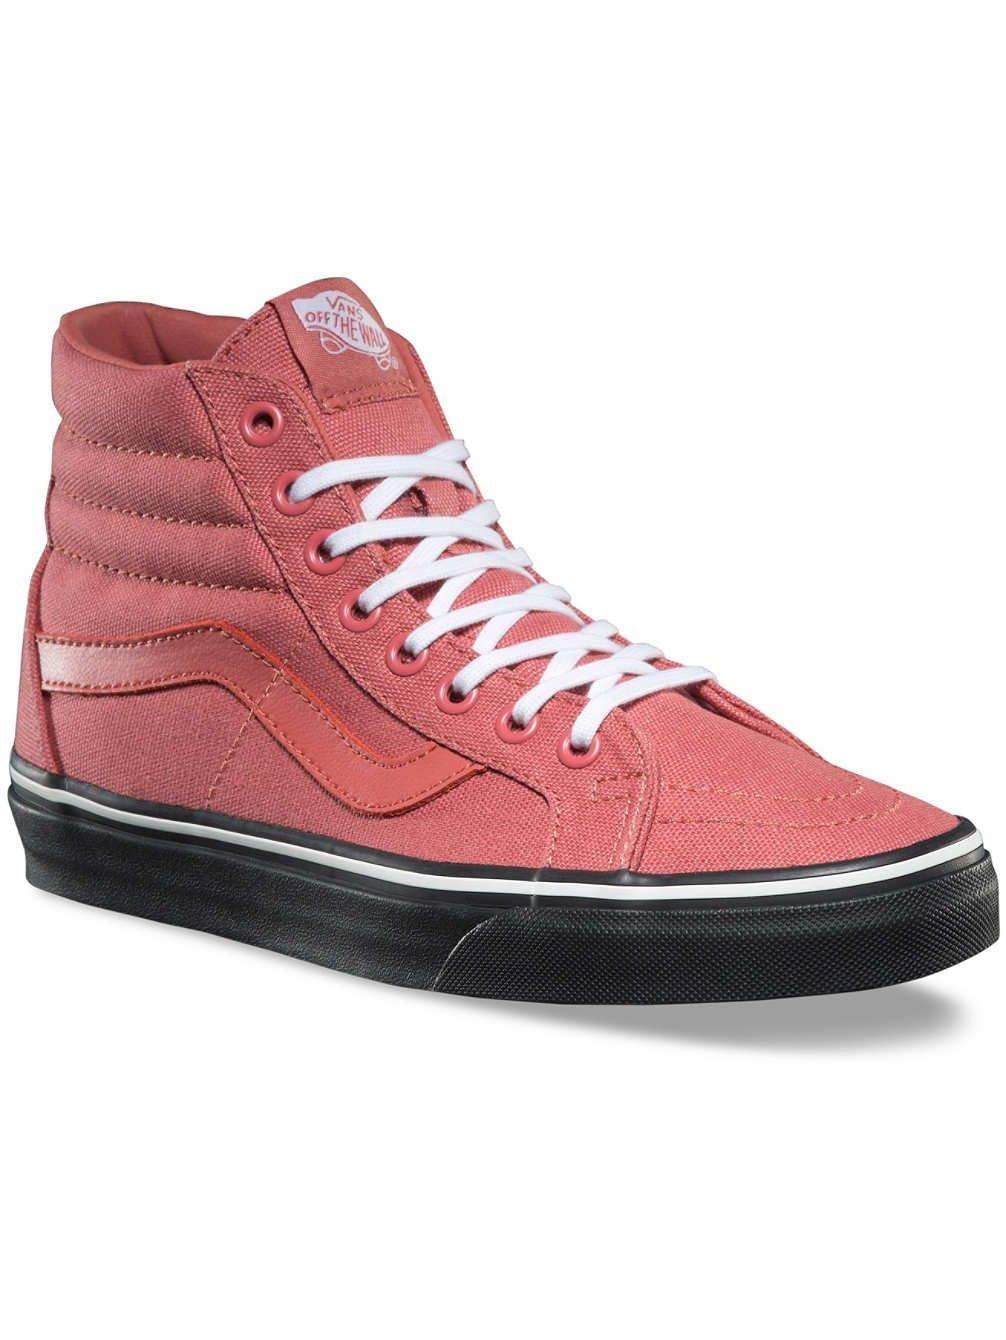 Vans Sk8-Hi Reissue Skate Shoes Faded Rose/Black 8 B(M) US